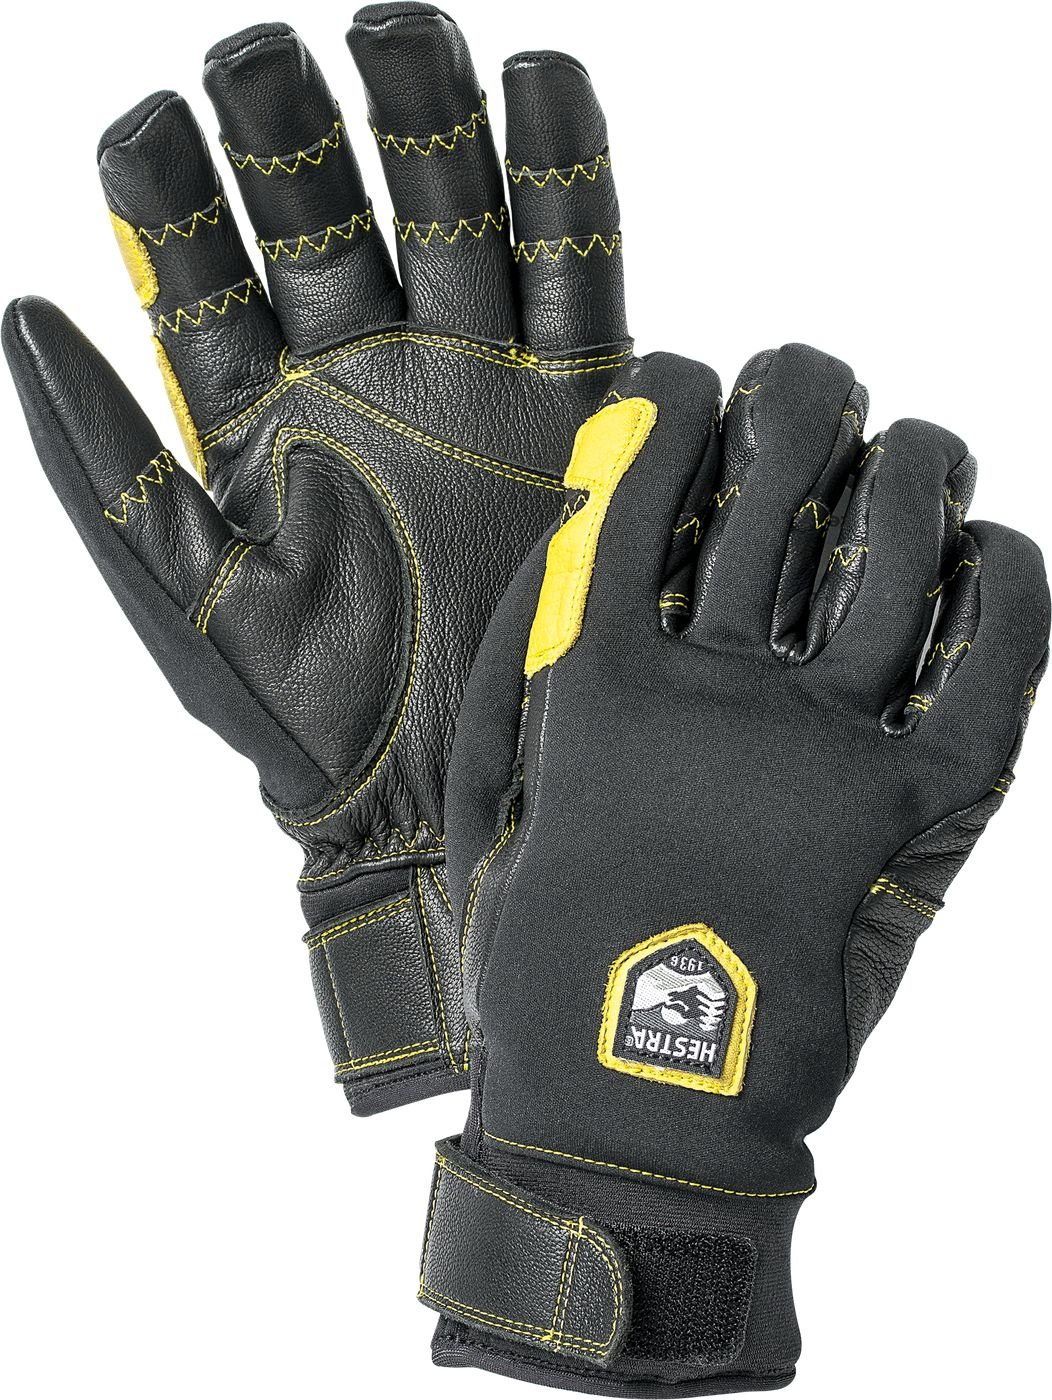 Hestra Outdoor Work Gloves: Ergo Grip Riding Cold Weather Gloves, Black/Black, 9